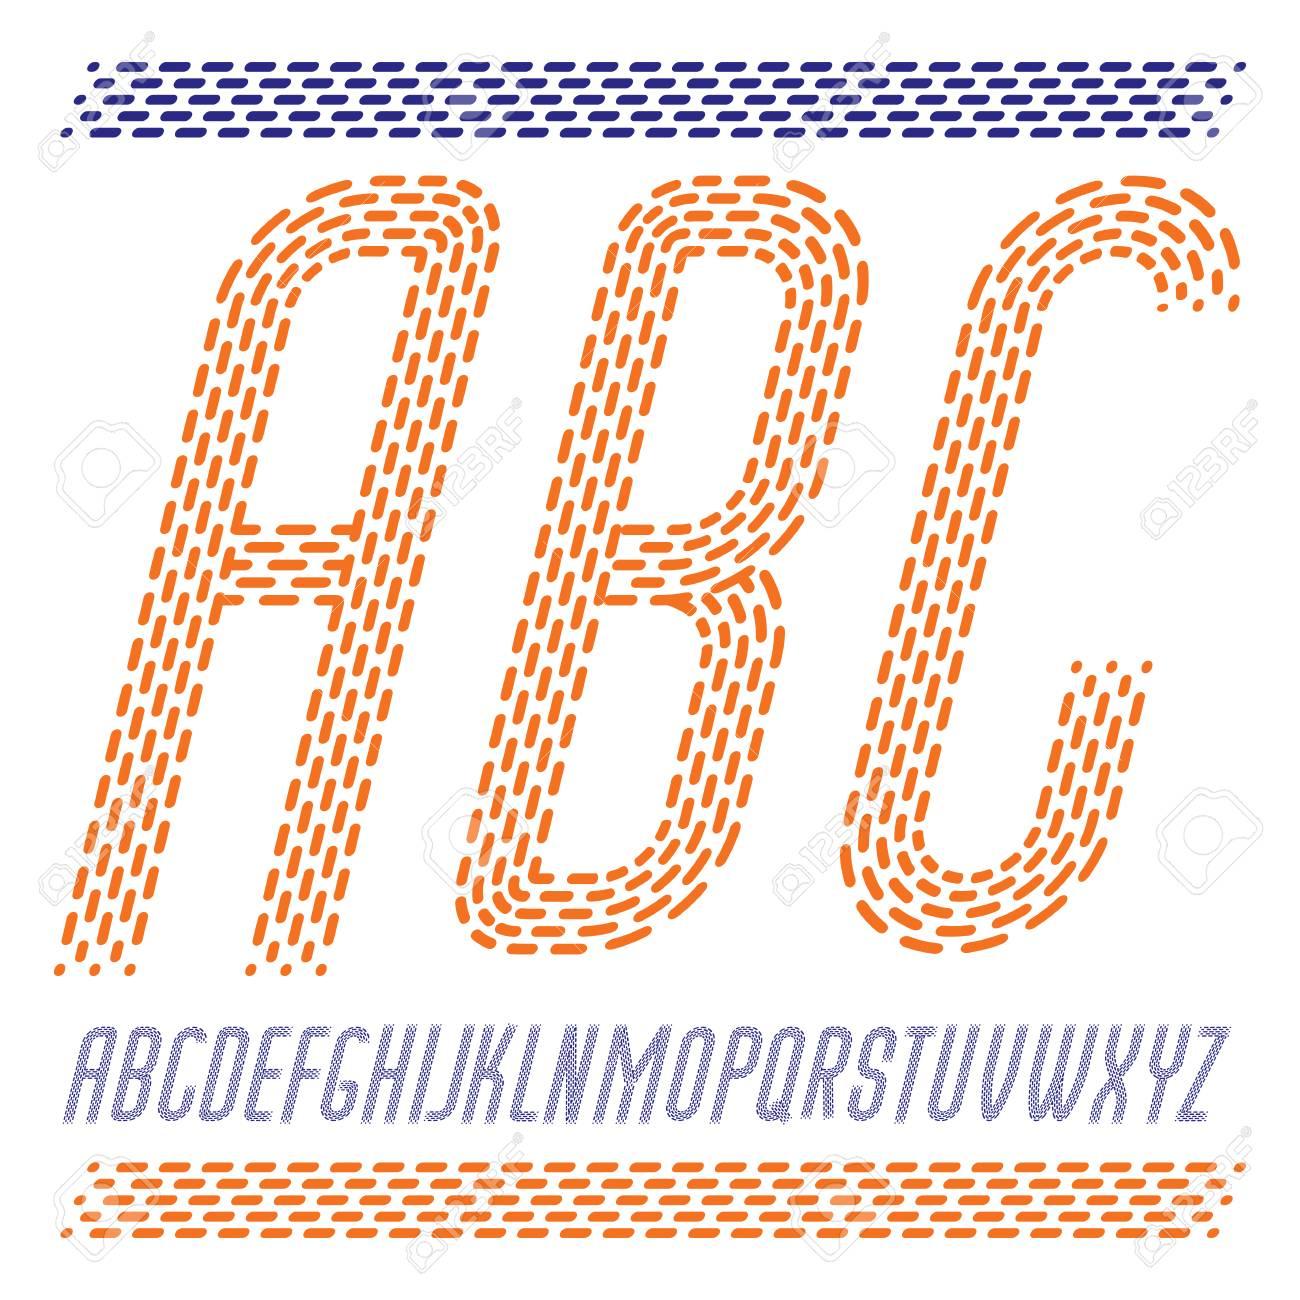 Abc Creation dedans vector capital condensed modern alphabet letters, abc set. rounded